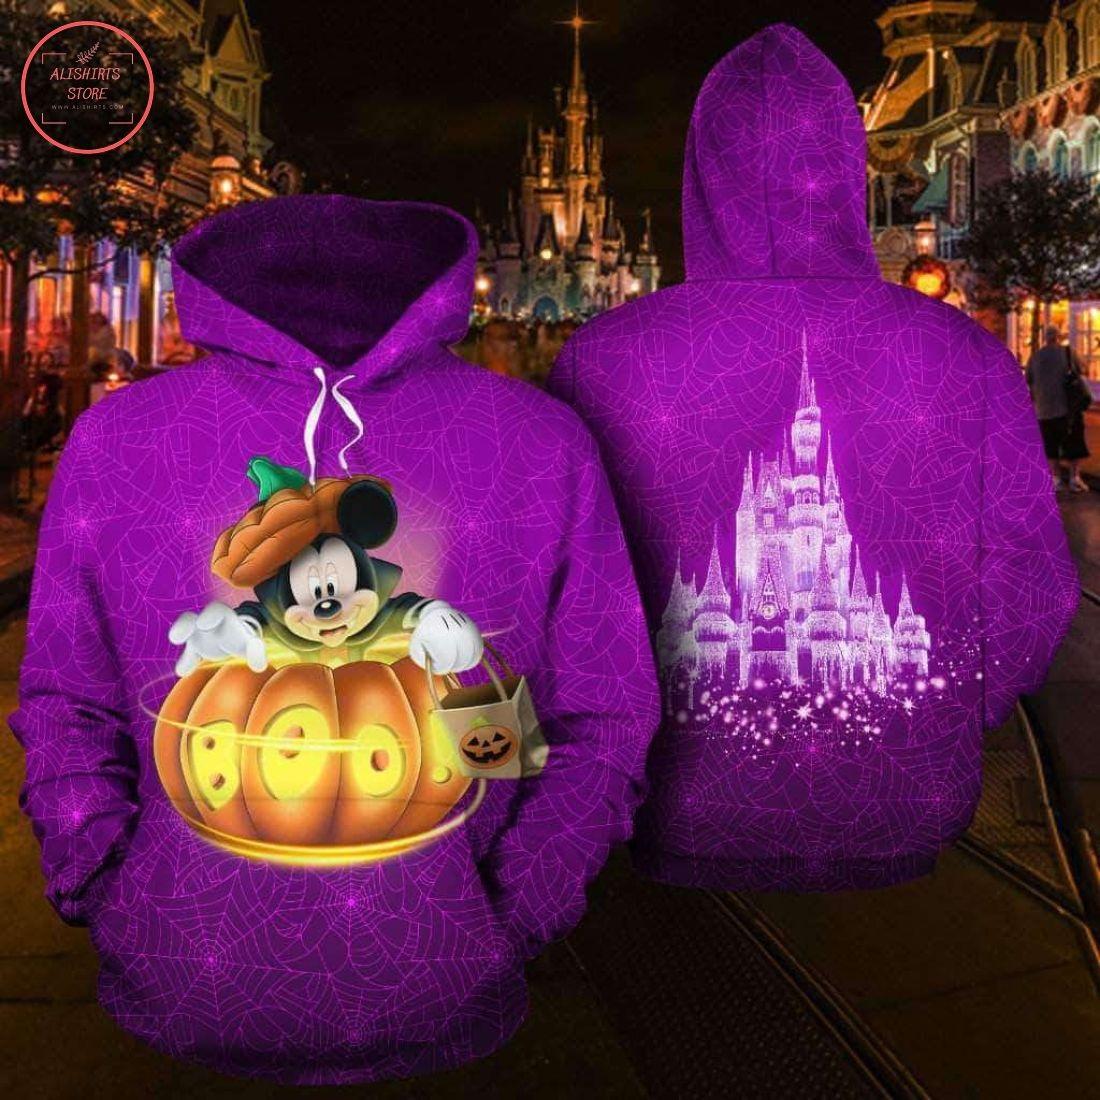 Pumpkin Boo Mickey Cosplay All Over Printed Hoodie